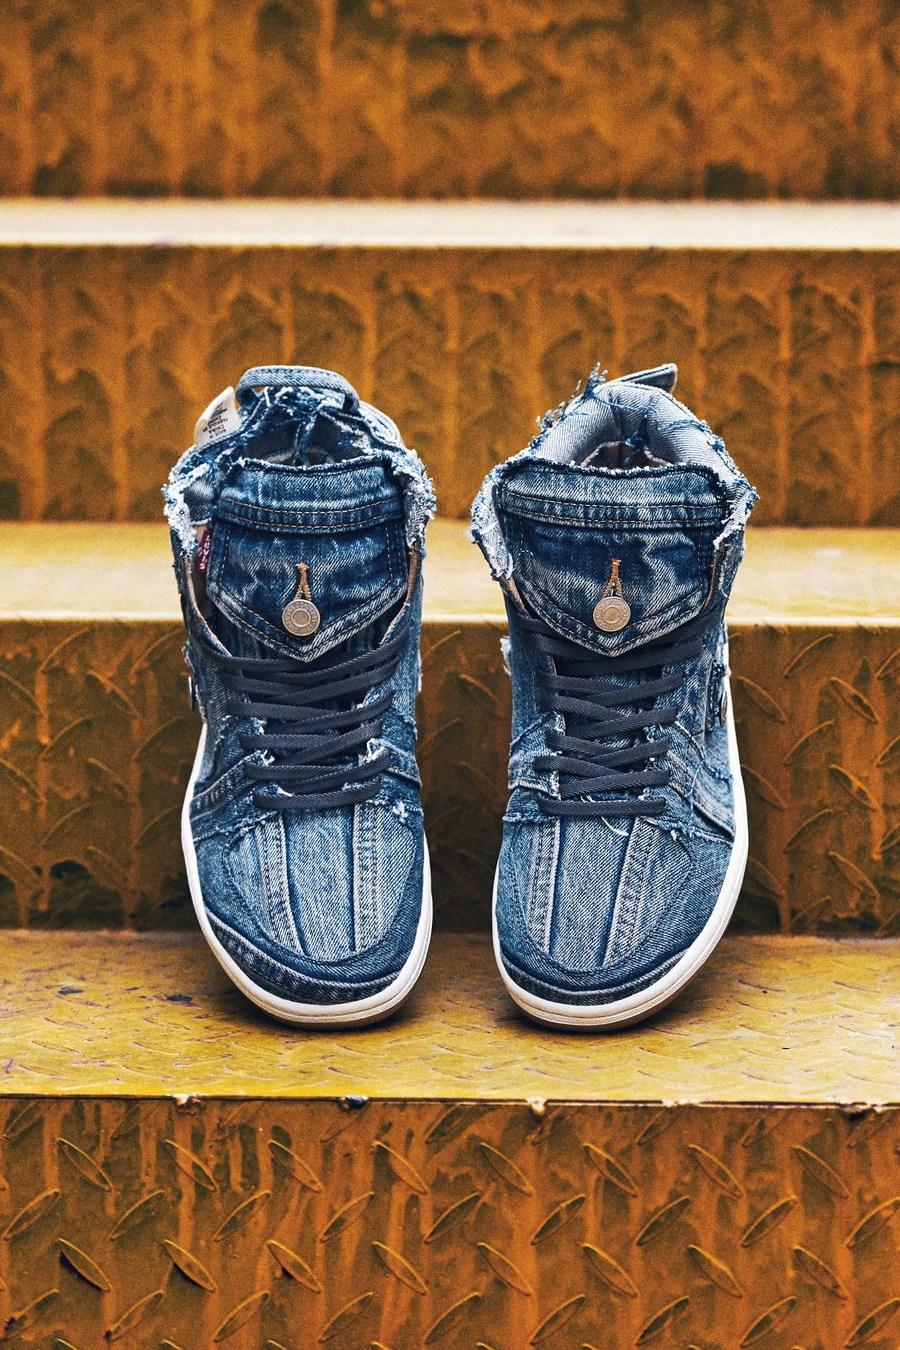 Air Jordan 1,Levi's,The Remade  细节更纯粹!Levi's x Air Jordan 1 客制版本欣赏